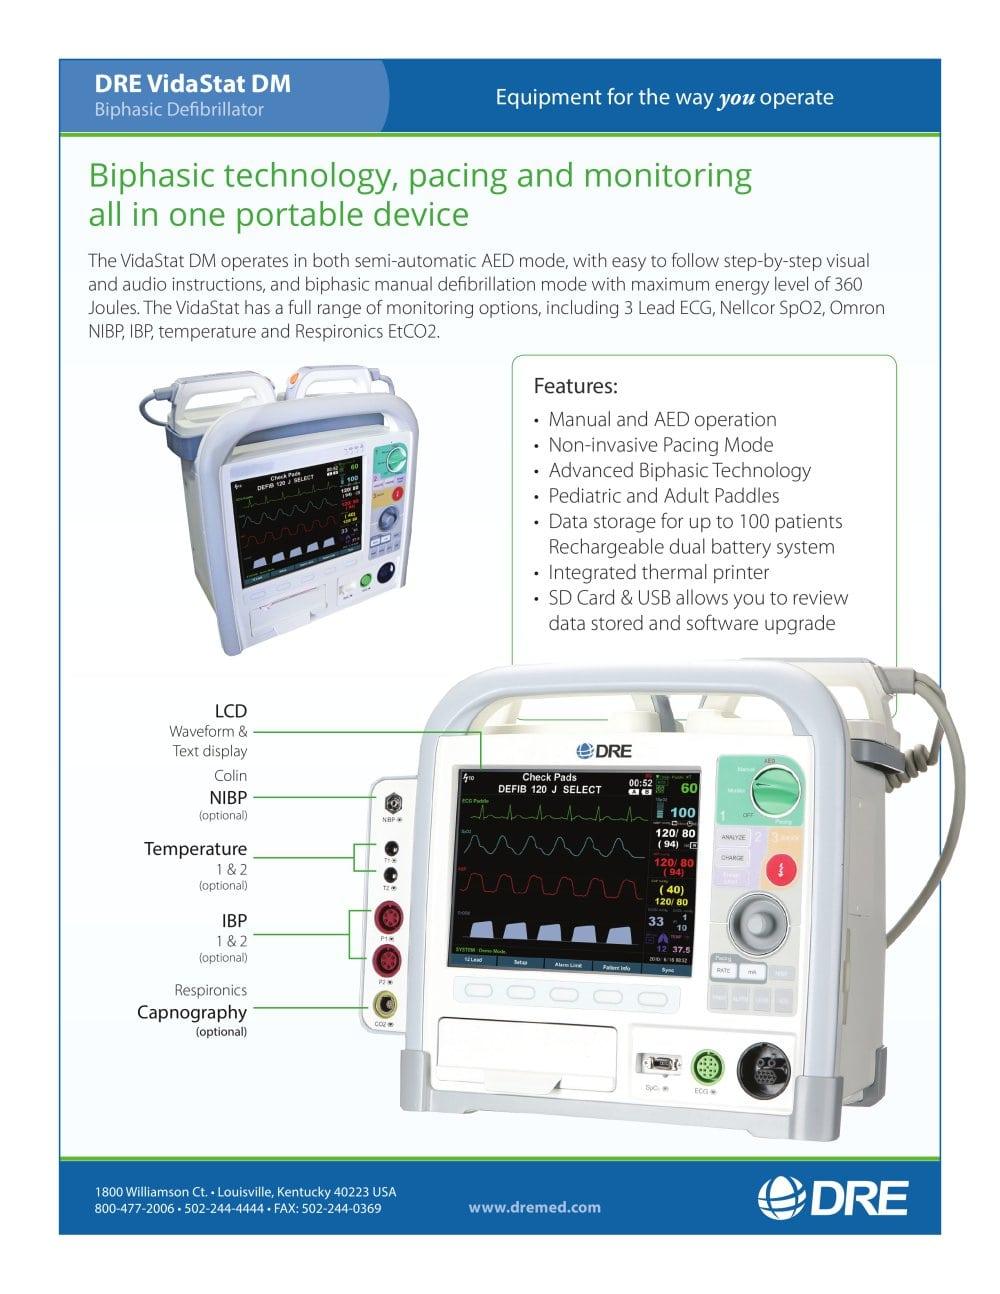 DRE VidaStat DM Biphasic Defibrillator with ECG Monitoring - 1 / 3 Pages